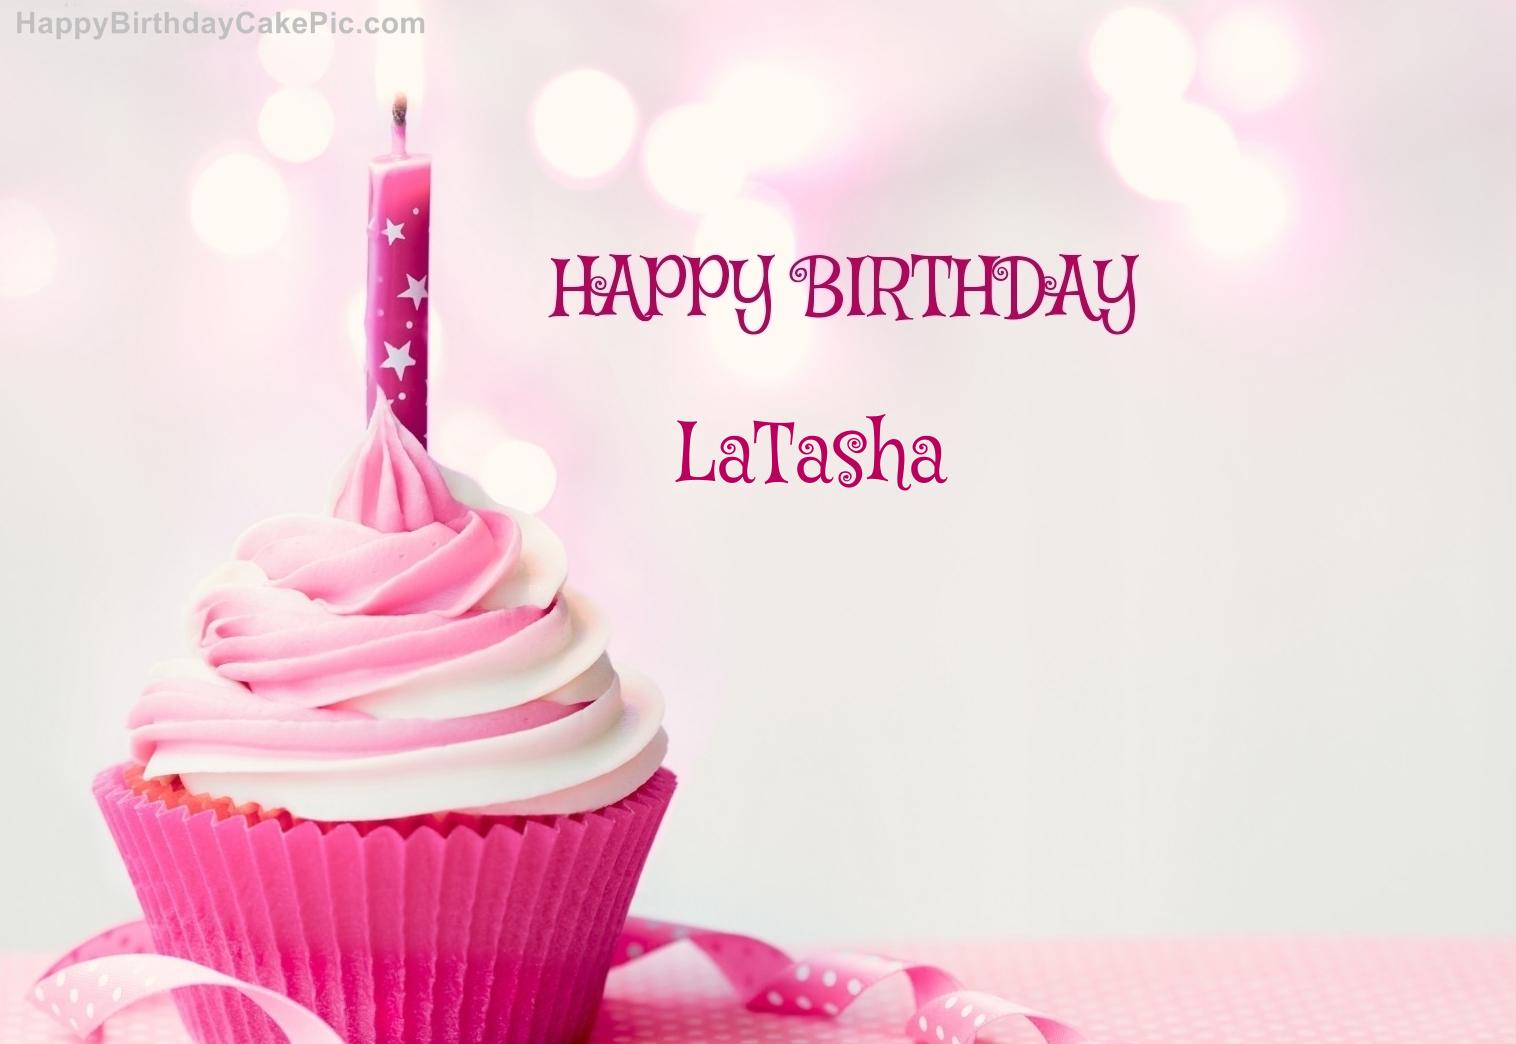 ️ Happy Birthday Cupcake Candle Pink Cake For Latasha